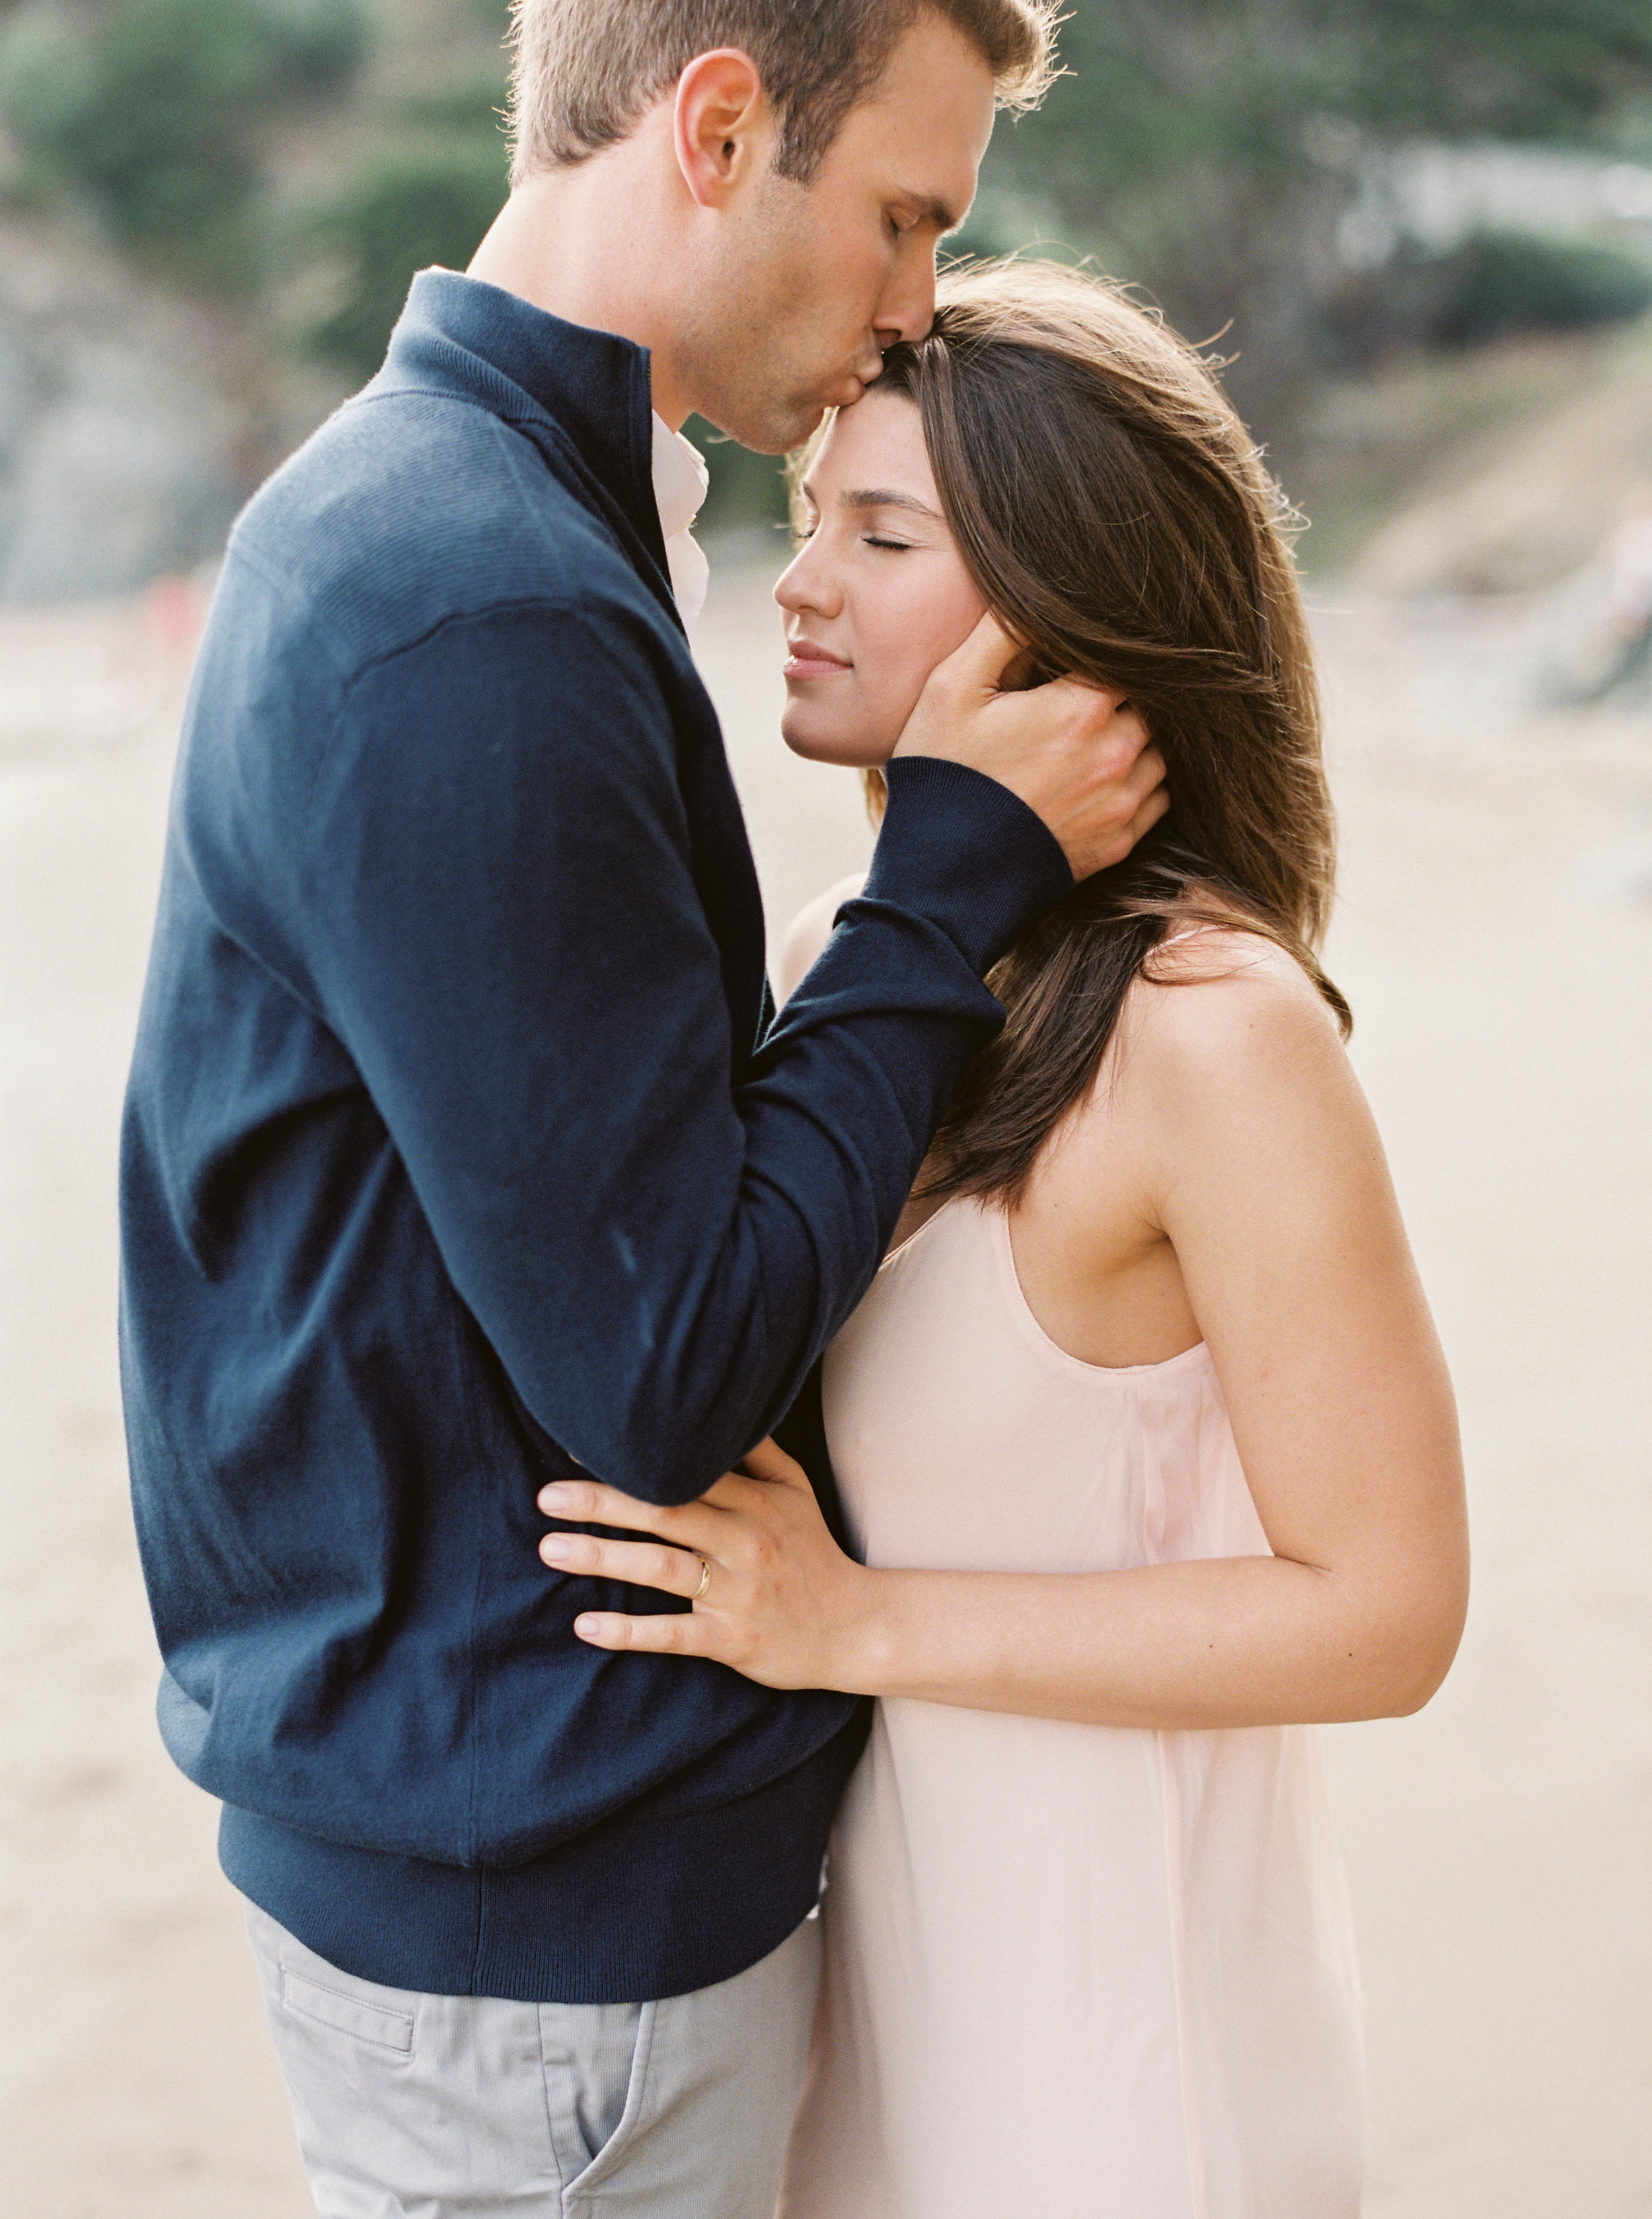 Meghan Mehan Photography - Fine Art Film Wedding Photography - San Francisco | Napa | Sonoma | Big Sur | Santa Barbara - 001.jpg